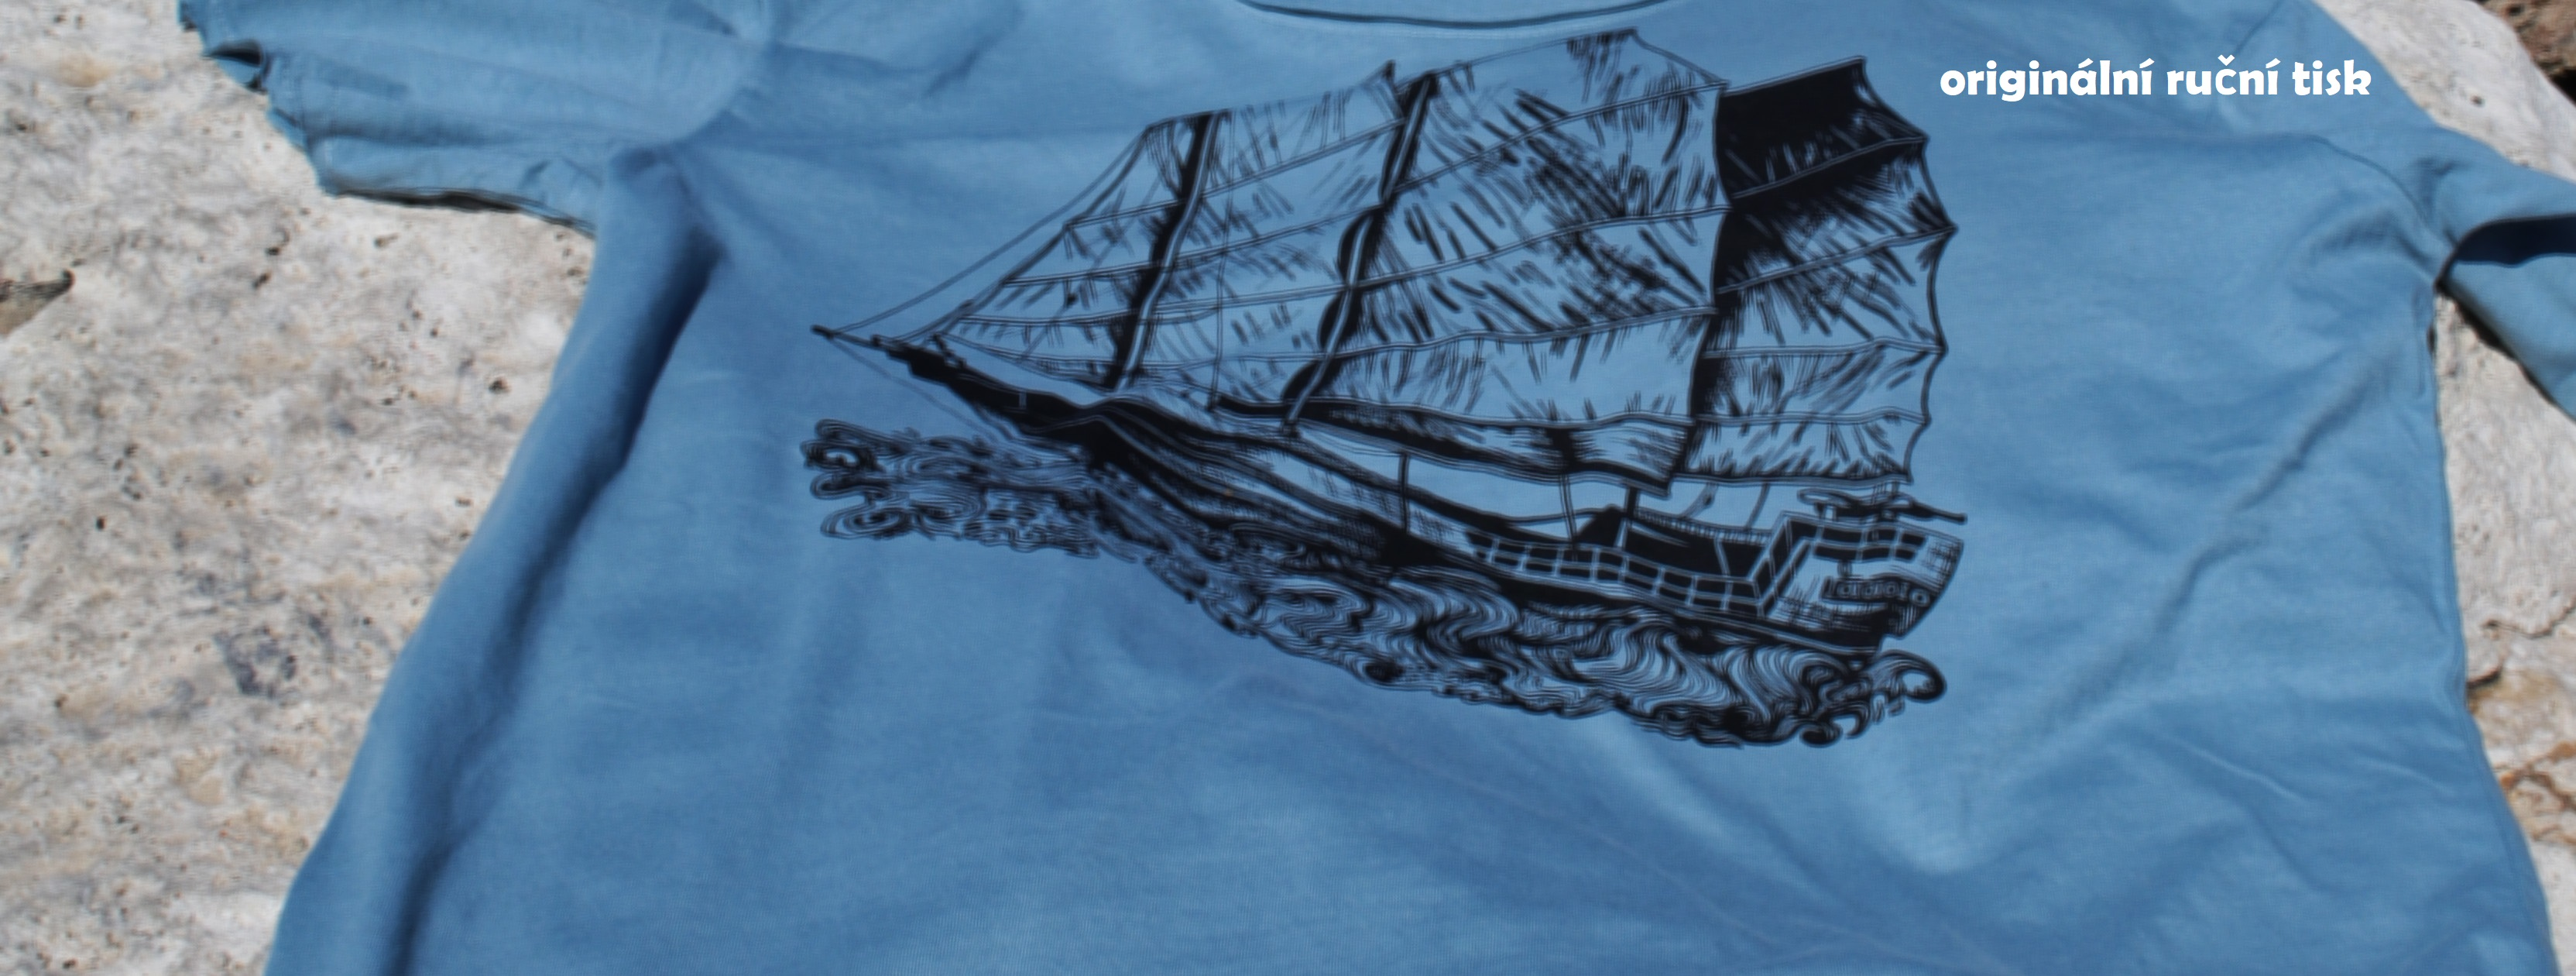 Tričko plachetnice čínská